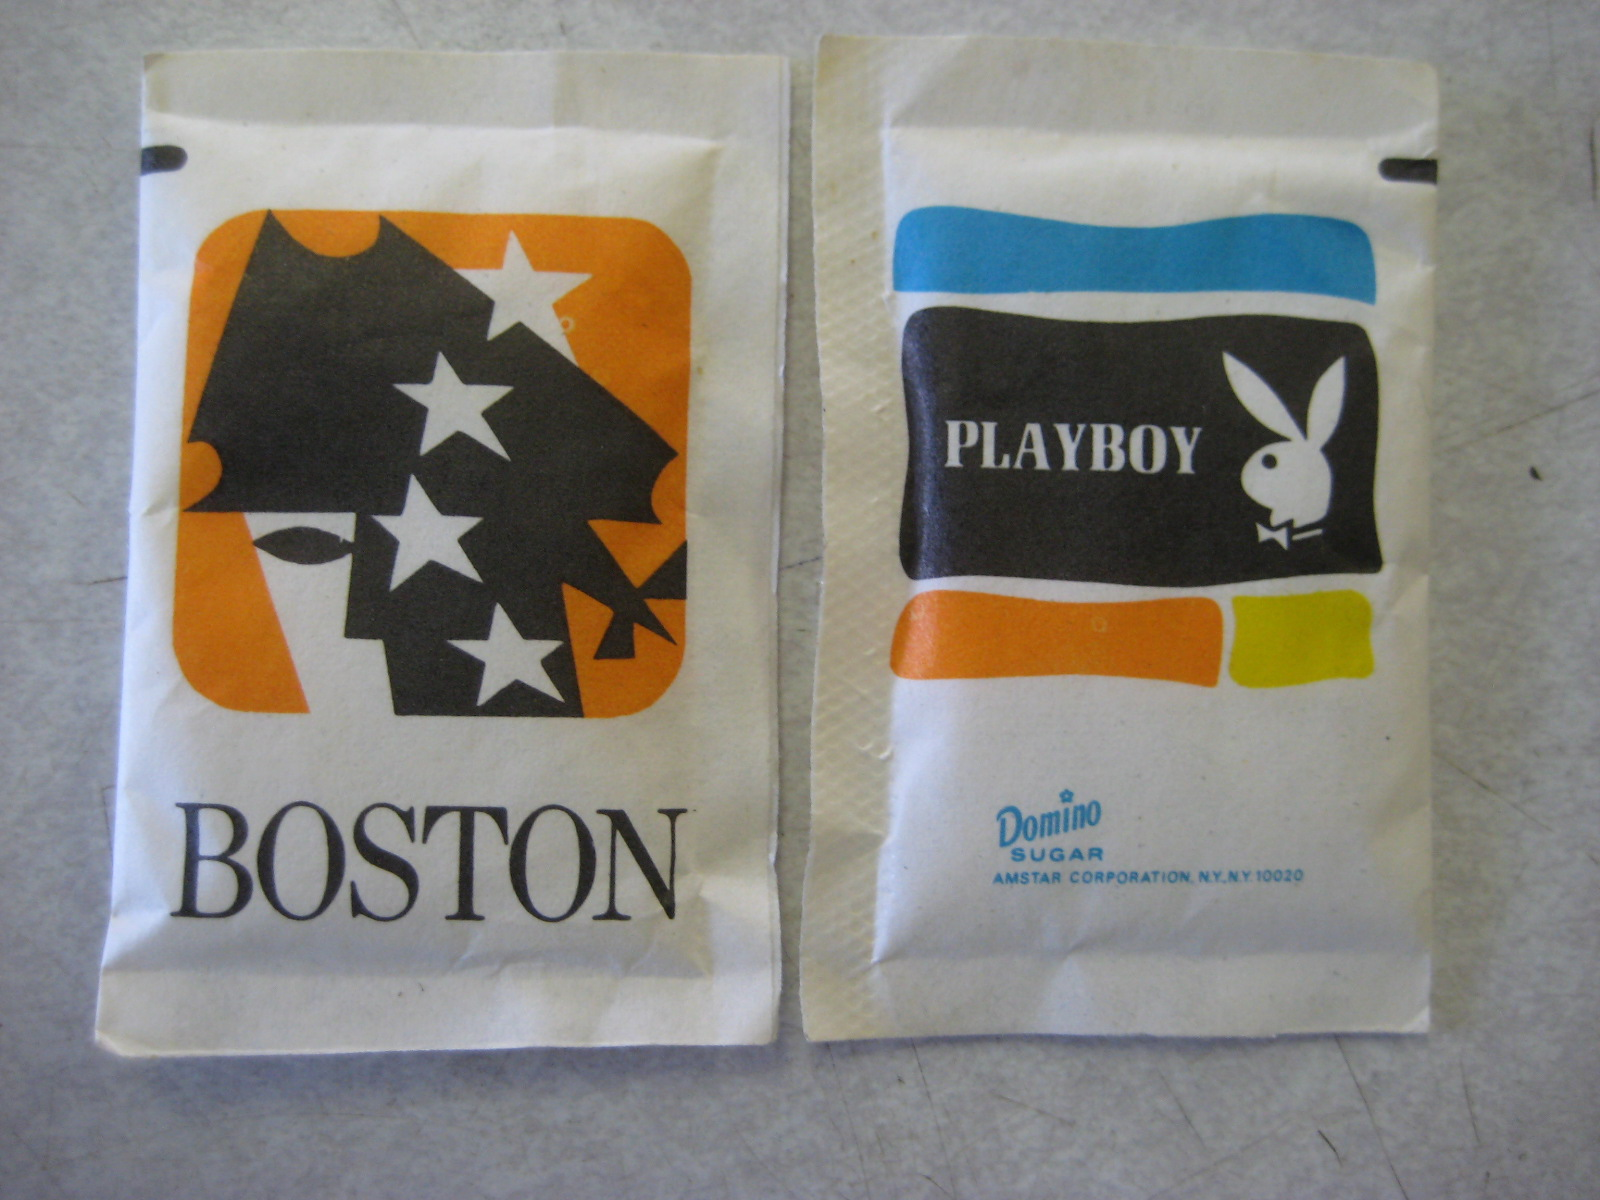 Playboy of Boston Sugar Packet